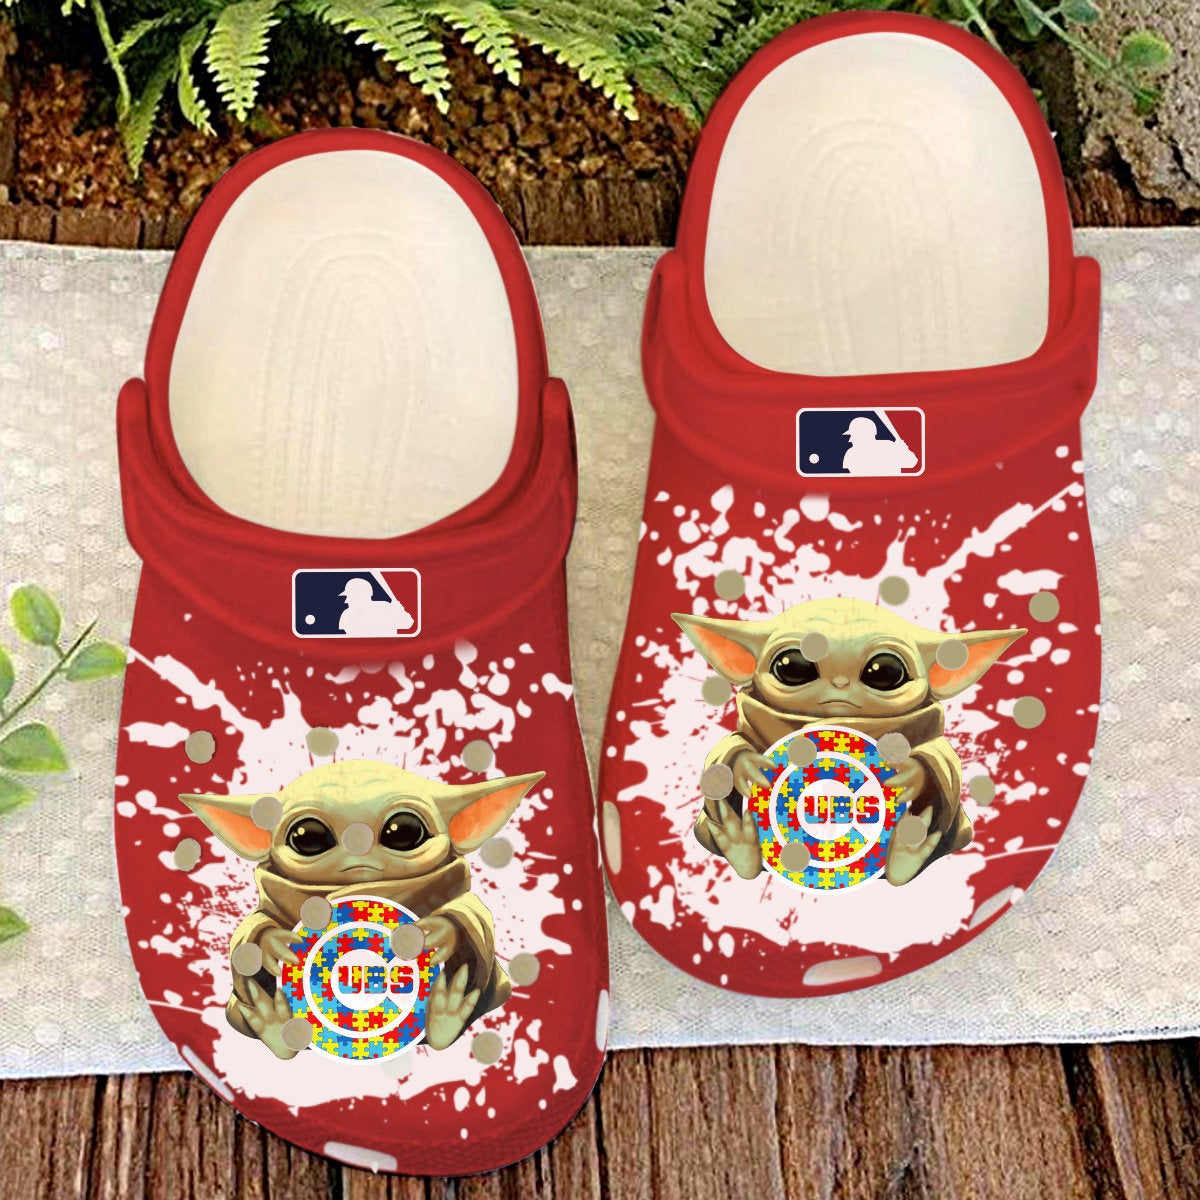 Chicago Cubs Baby Yoda Autism Crocs Clog Shoes